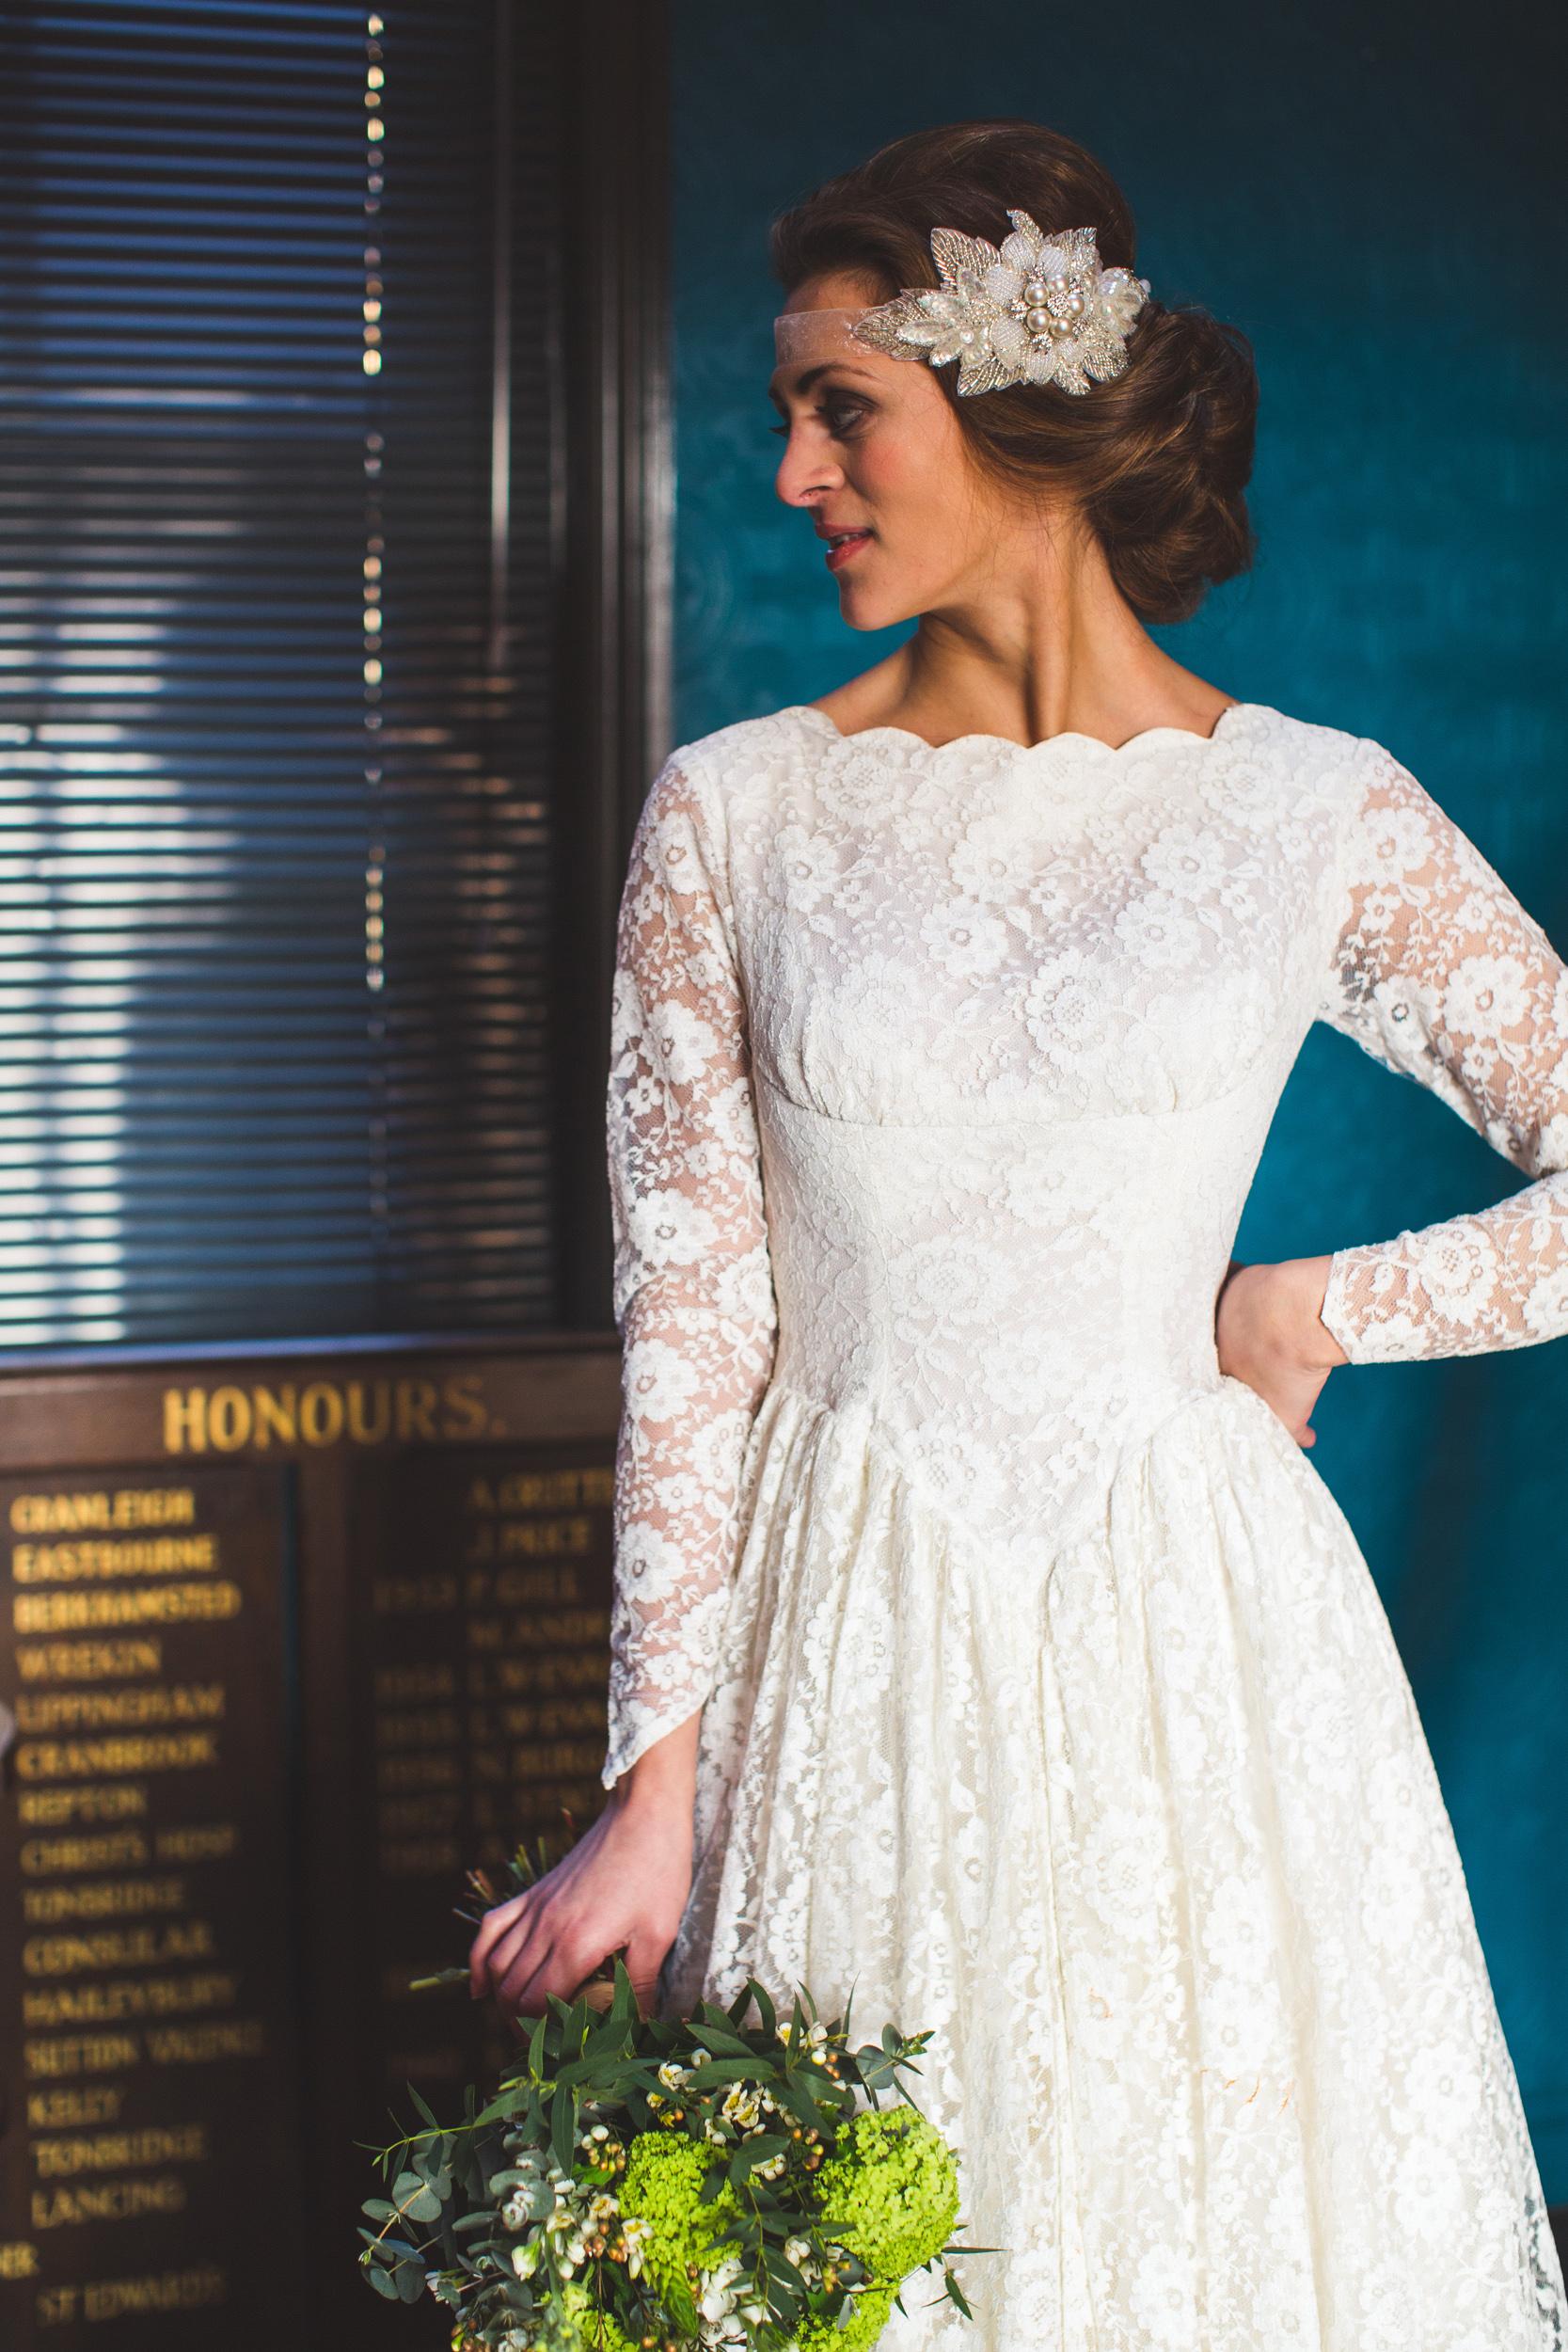 kate-beaumont-vintage-bridal-wedding-dresses-Sheffield-S6-29.jpg